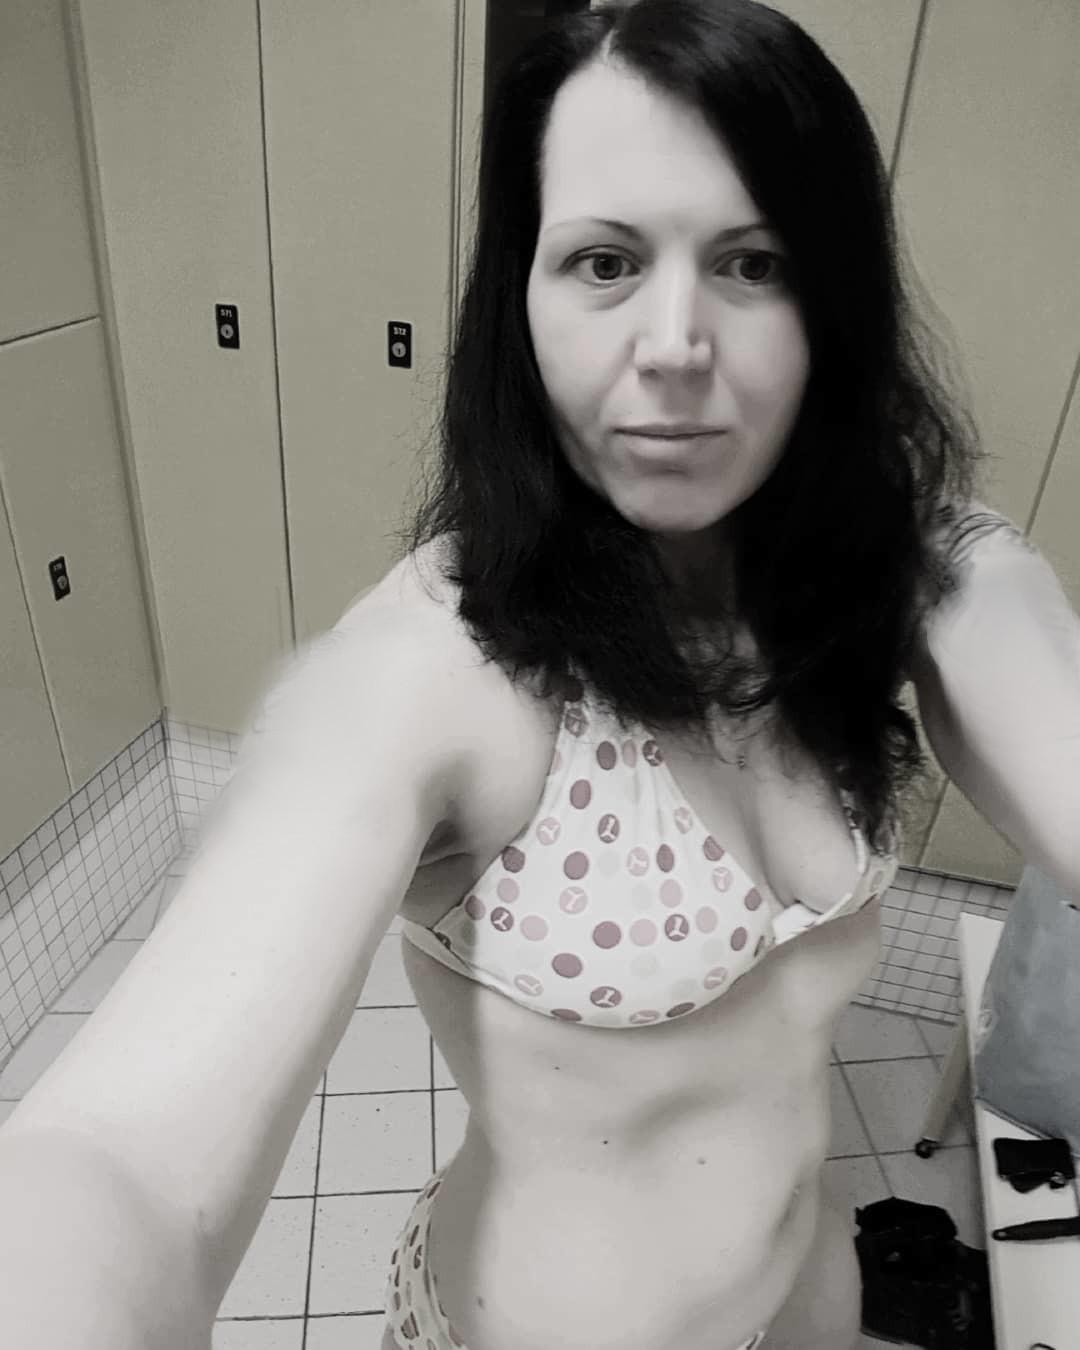 Nude pixhost Debbie McGee